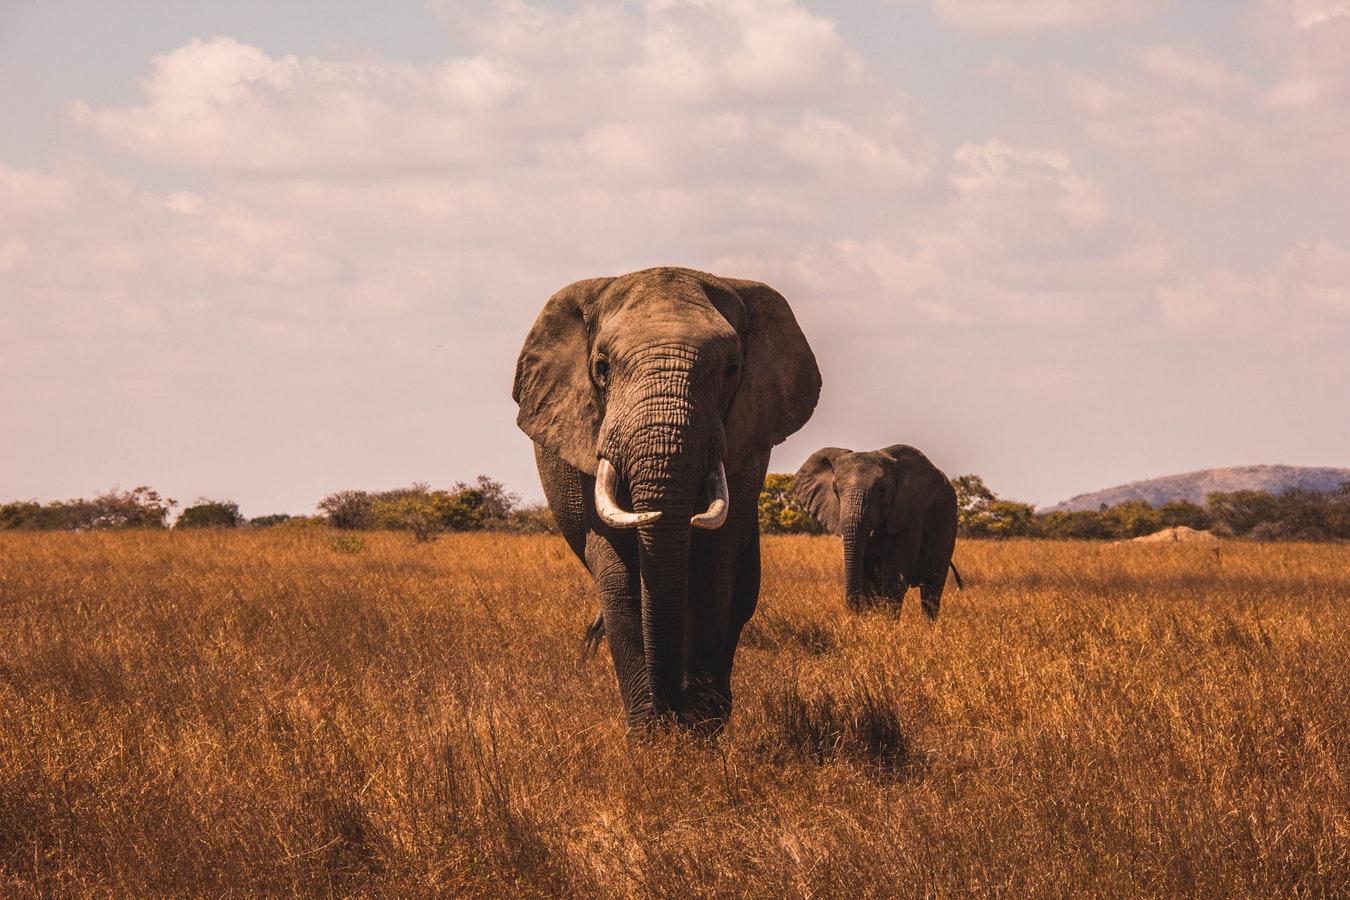 elephant on a safari